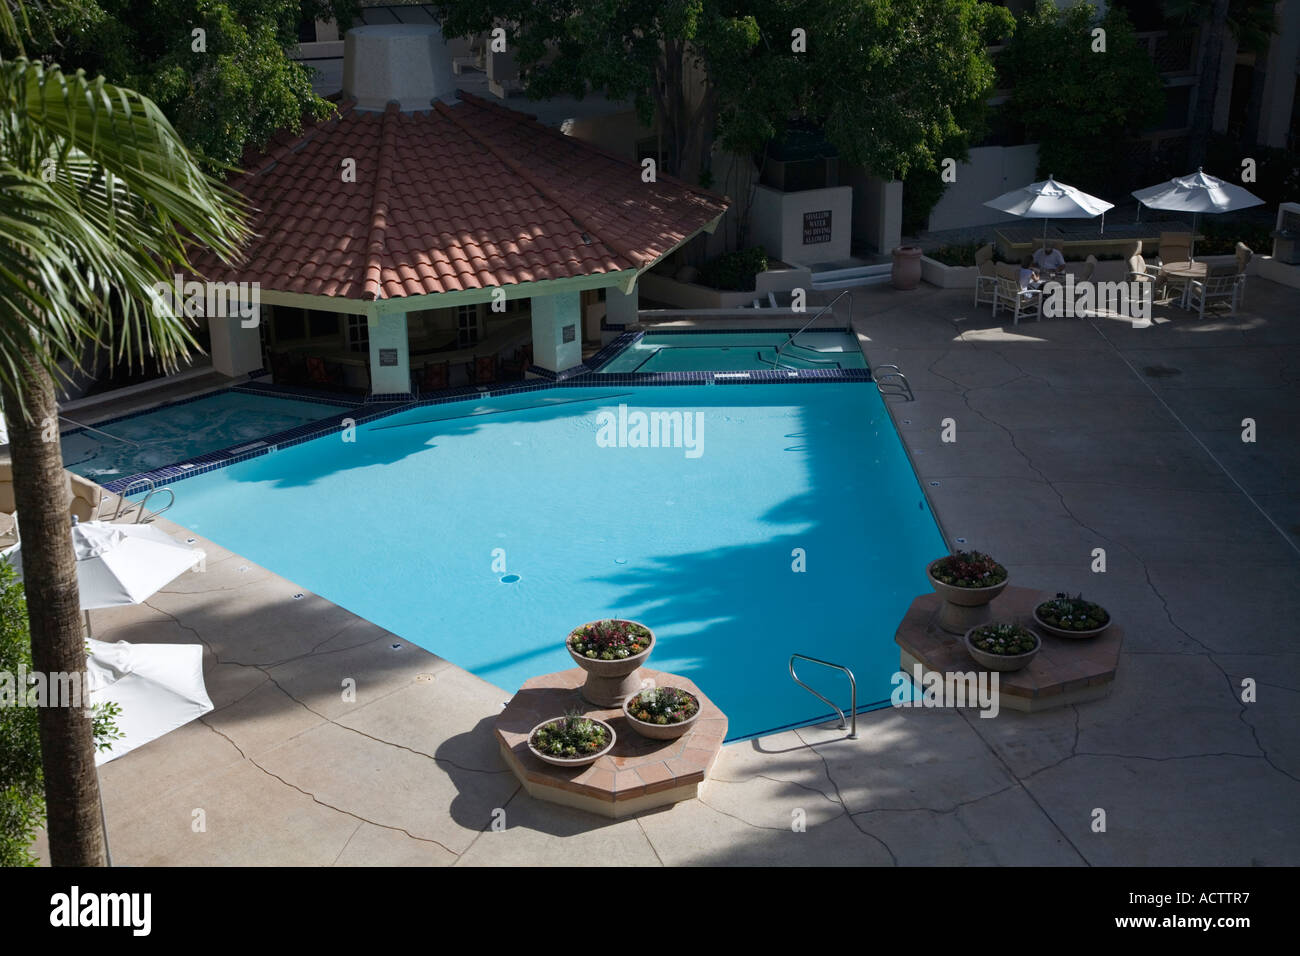 united arizona phoenix swimming pool stock photos united arizona phoenix swimming pool stock